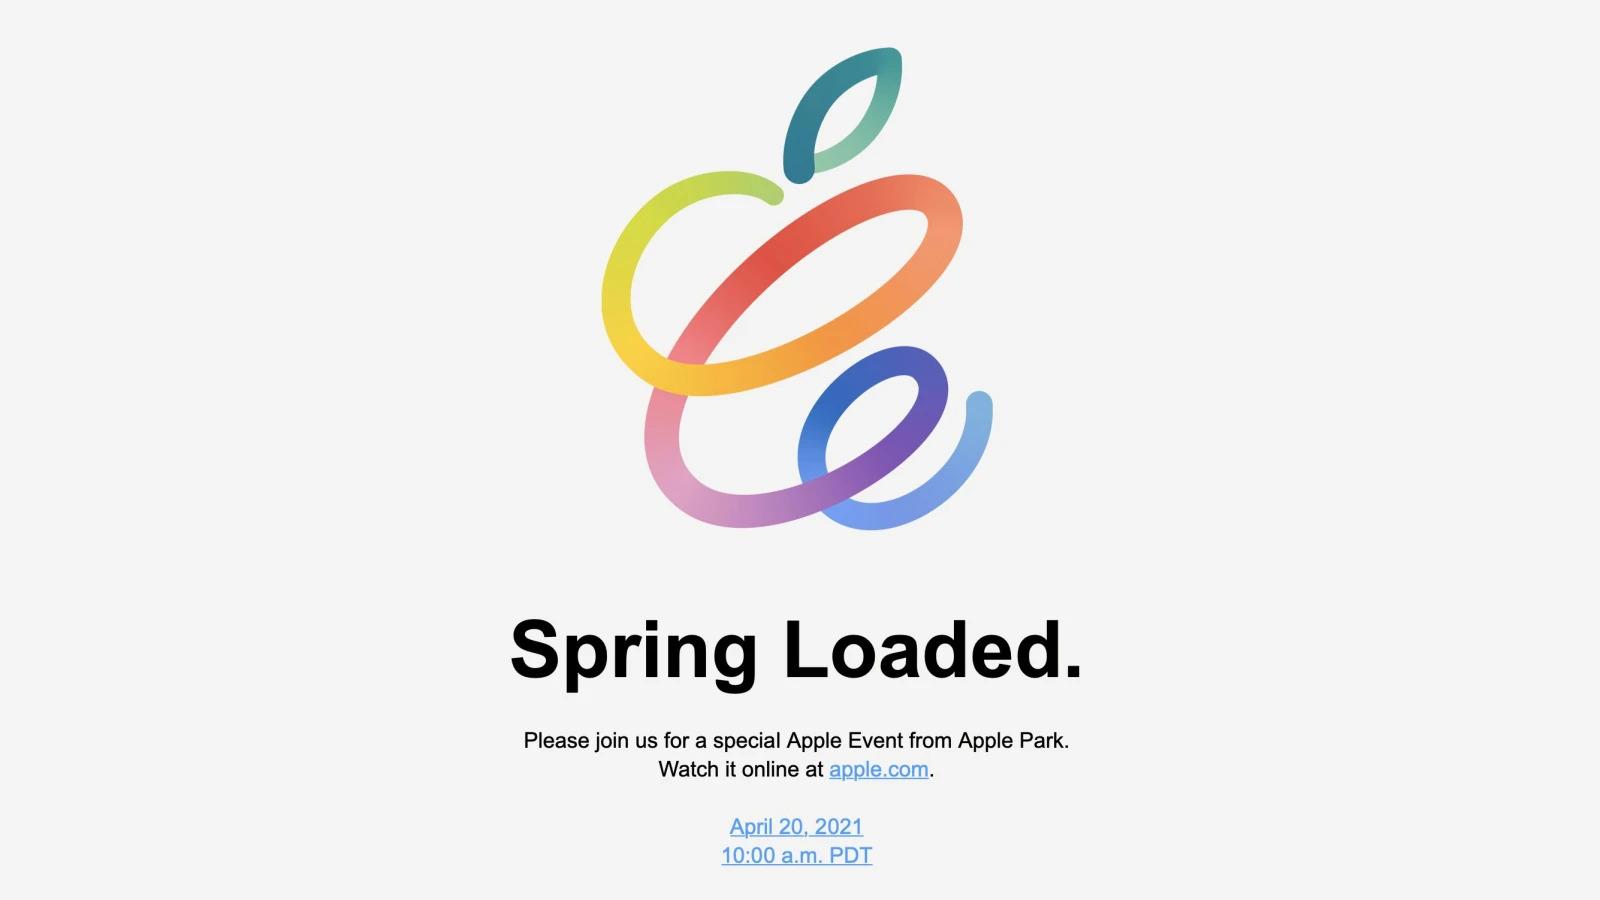 Apple Spring Loaded event